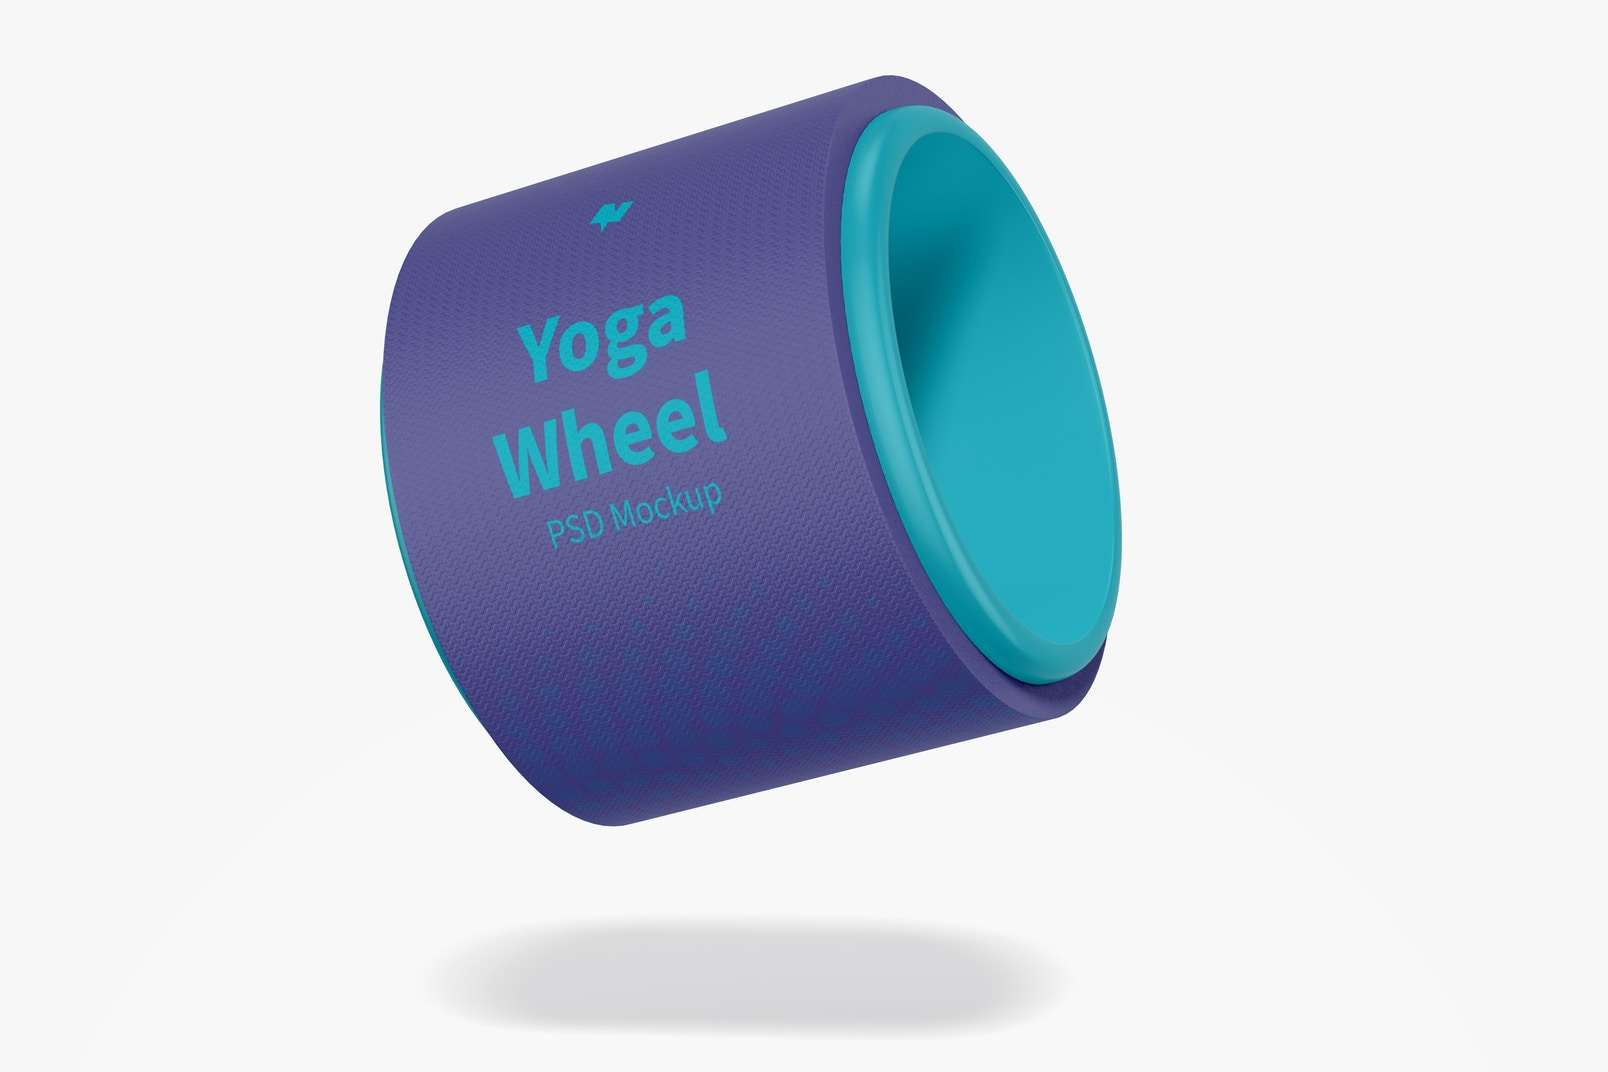 Yoga Wheel Mockup, Floating